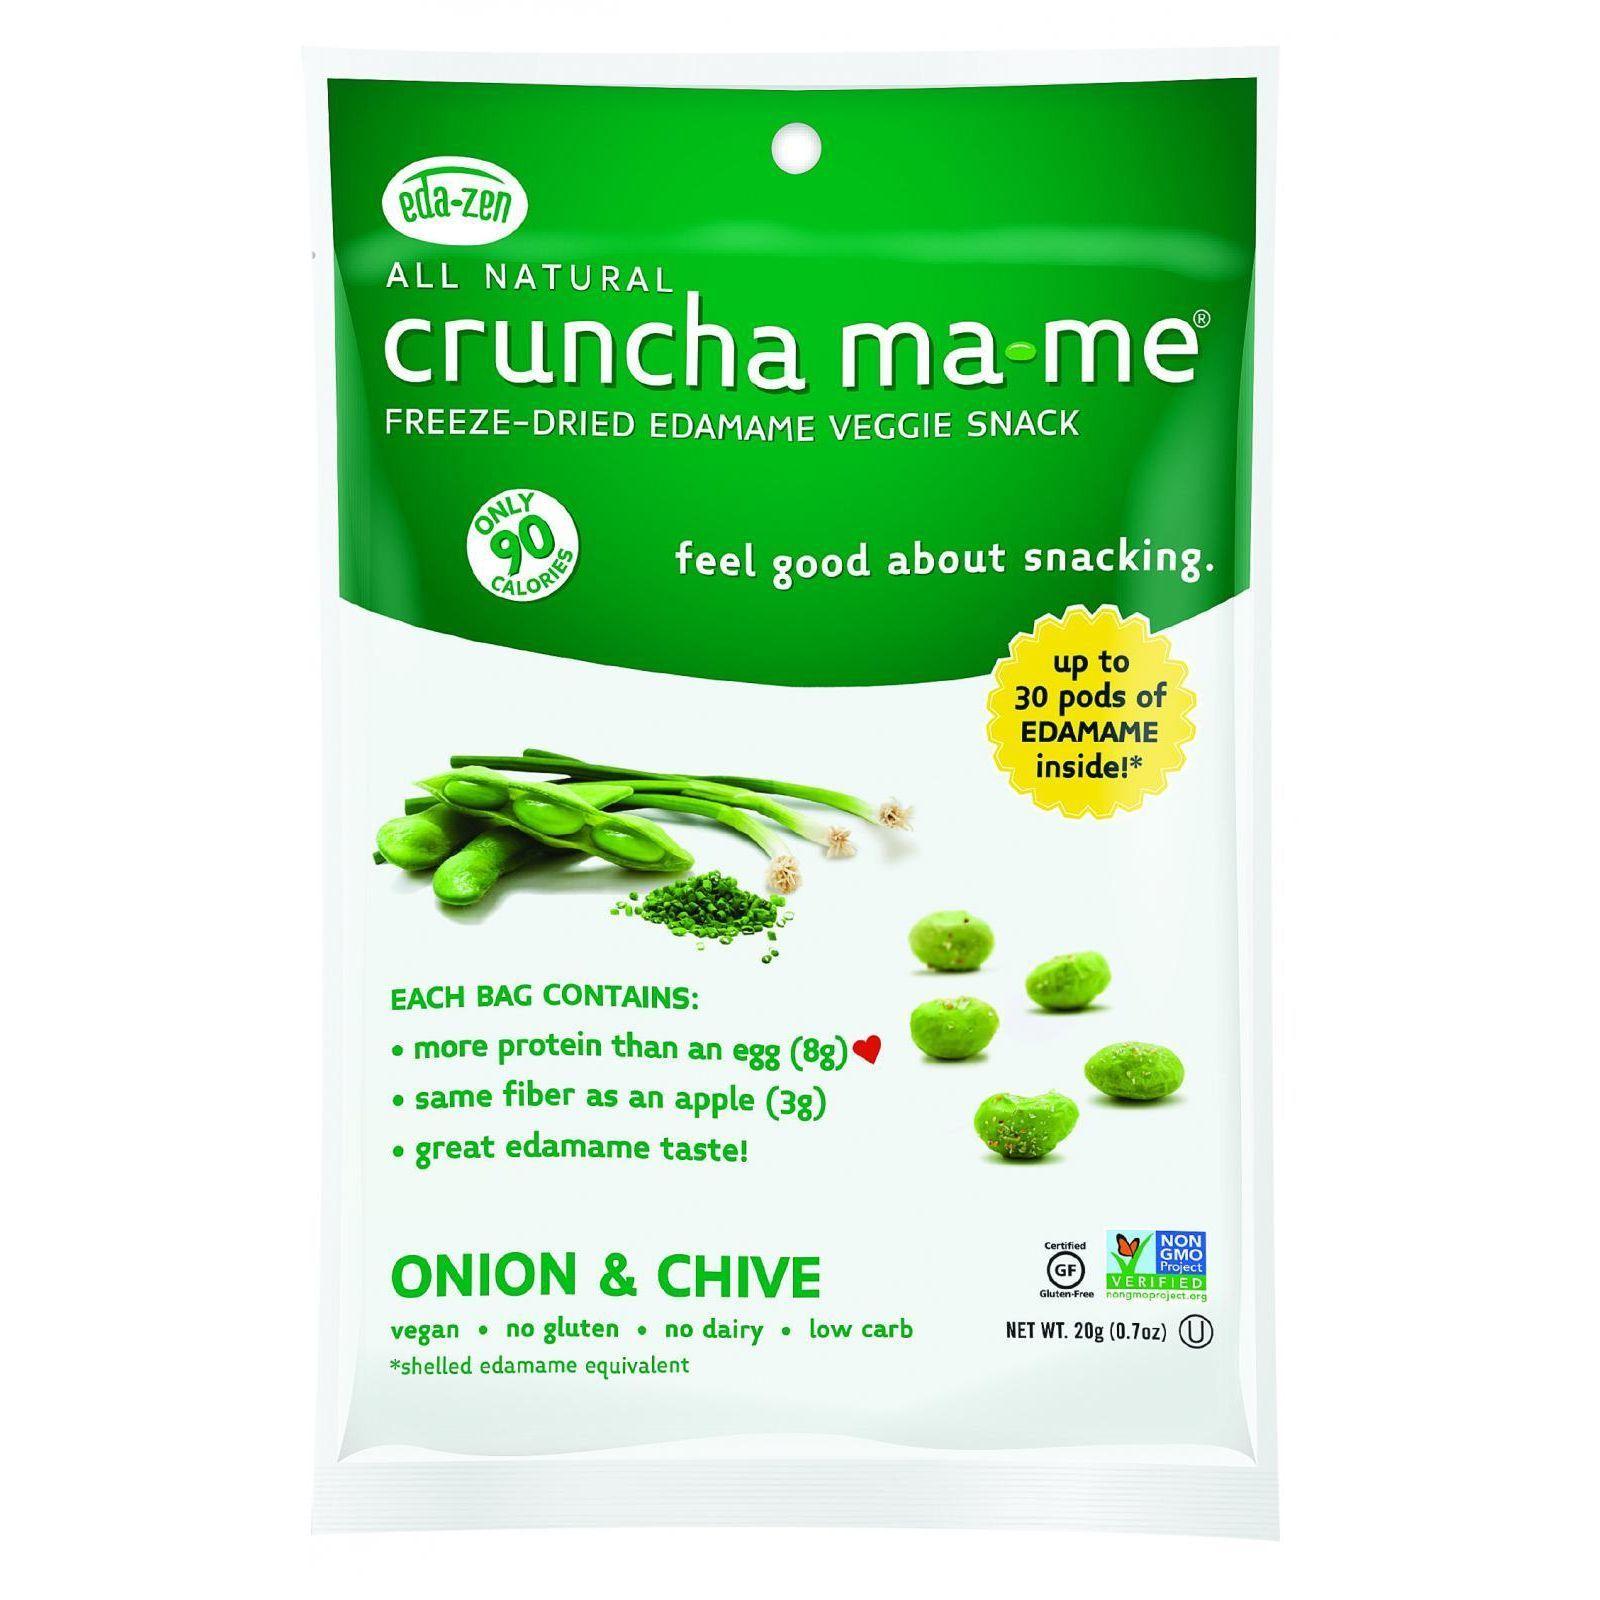 Eda-Zen Cruncha Ma Me - Onion and Chive - .7 oz - Case of 8